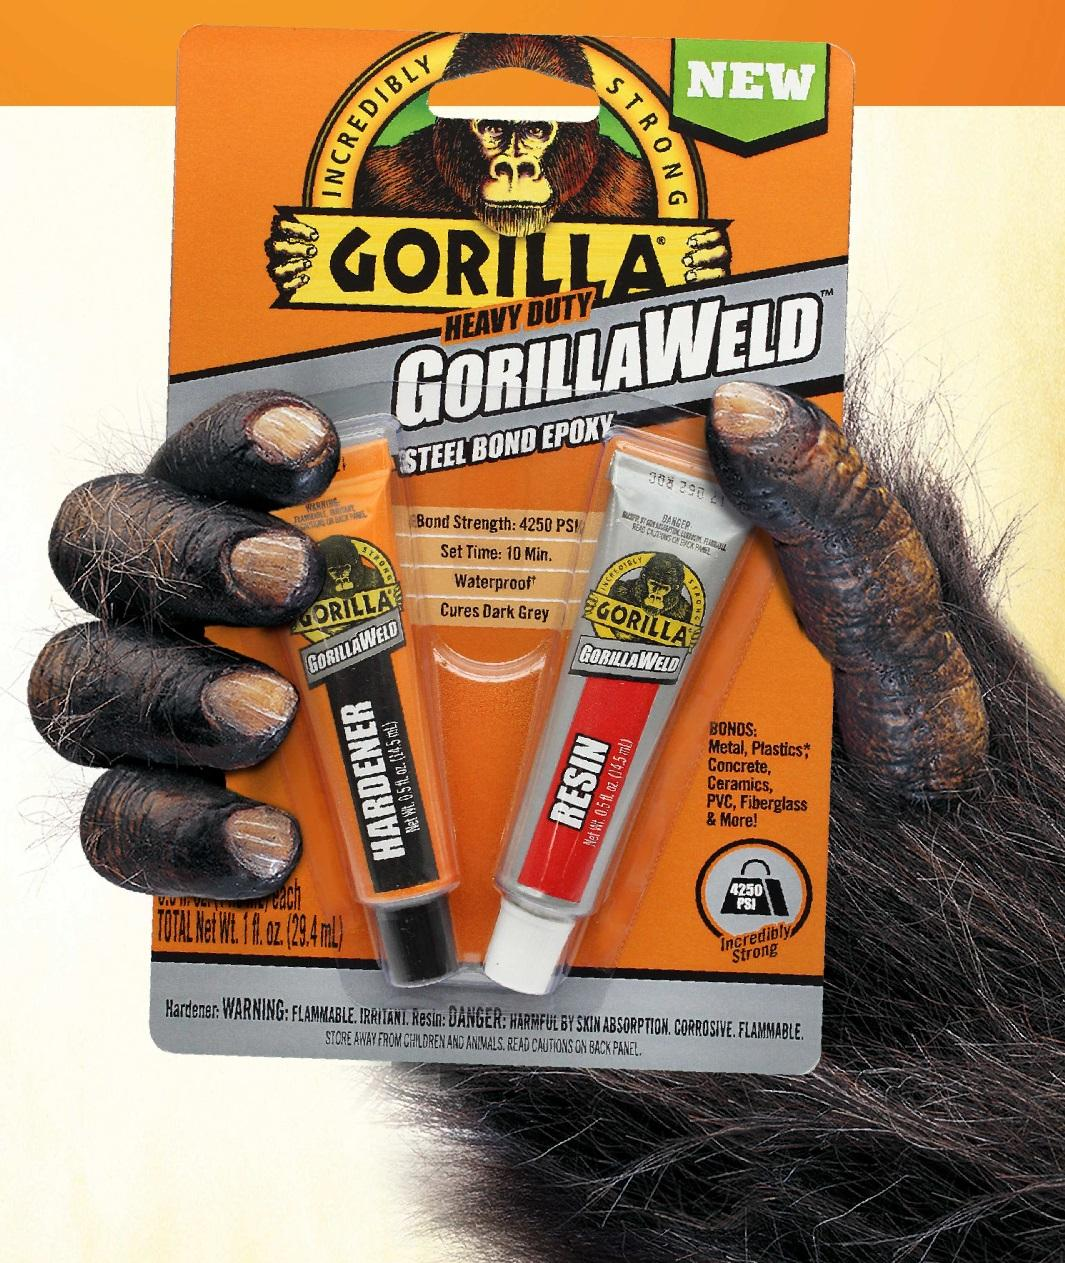 Gorilla Heavy Duty Gorillaweld Steel Bond 2 Part Epoxy Resin 280 Gram